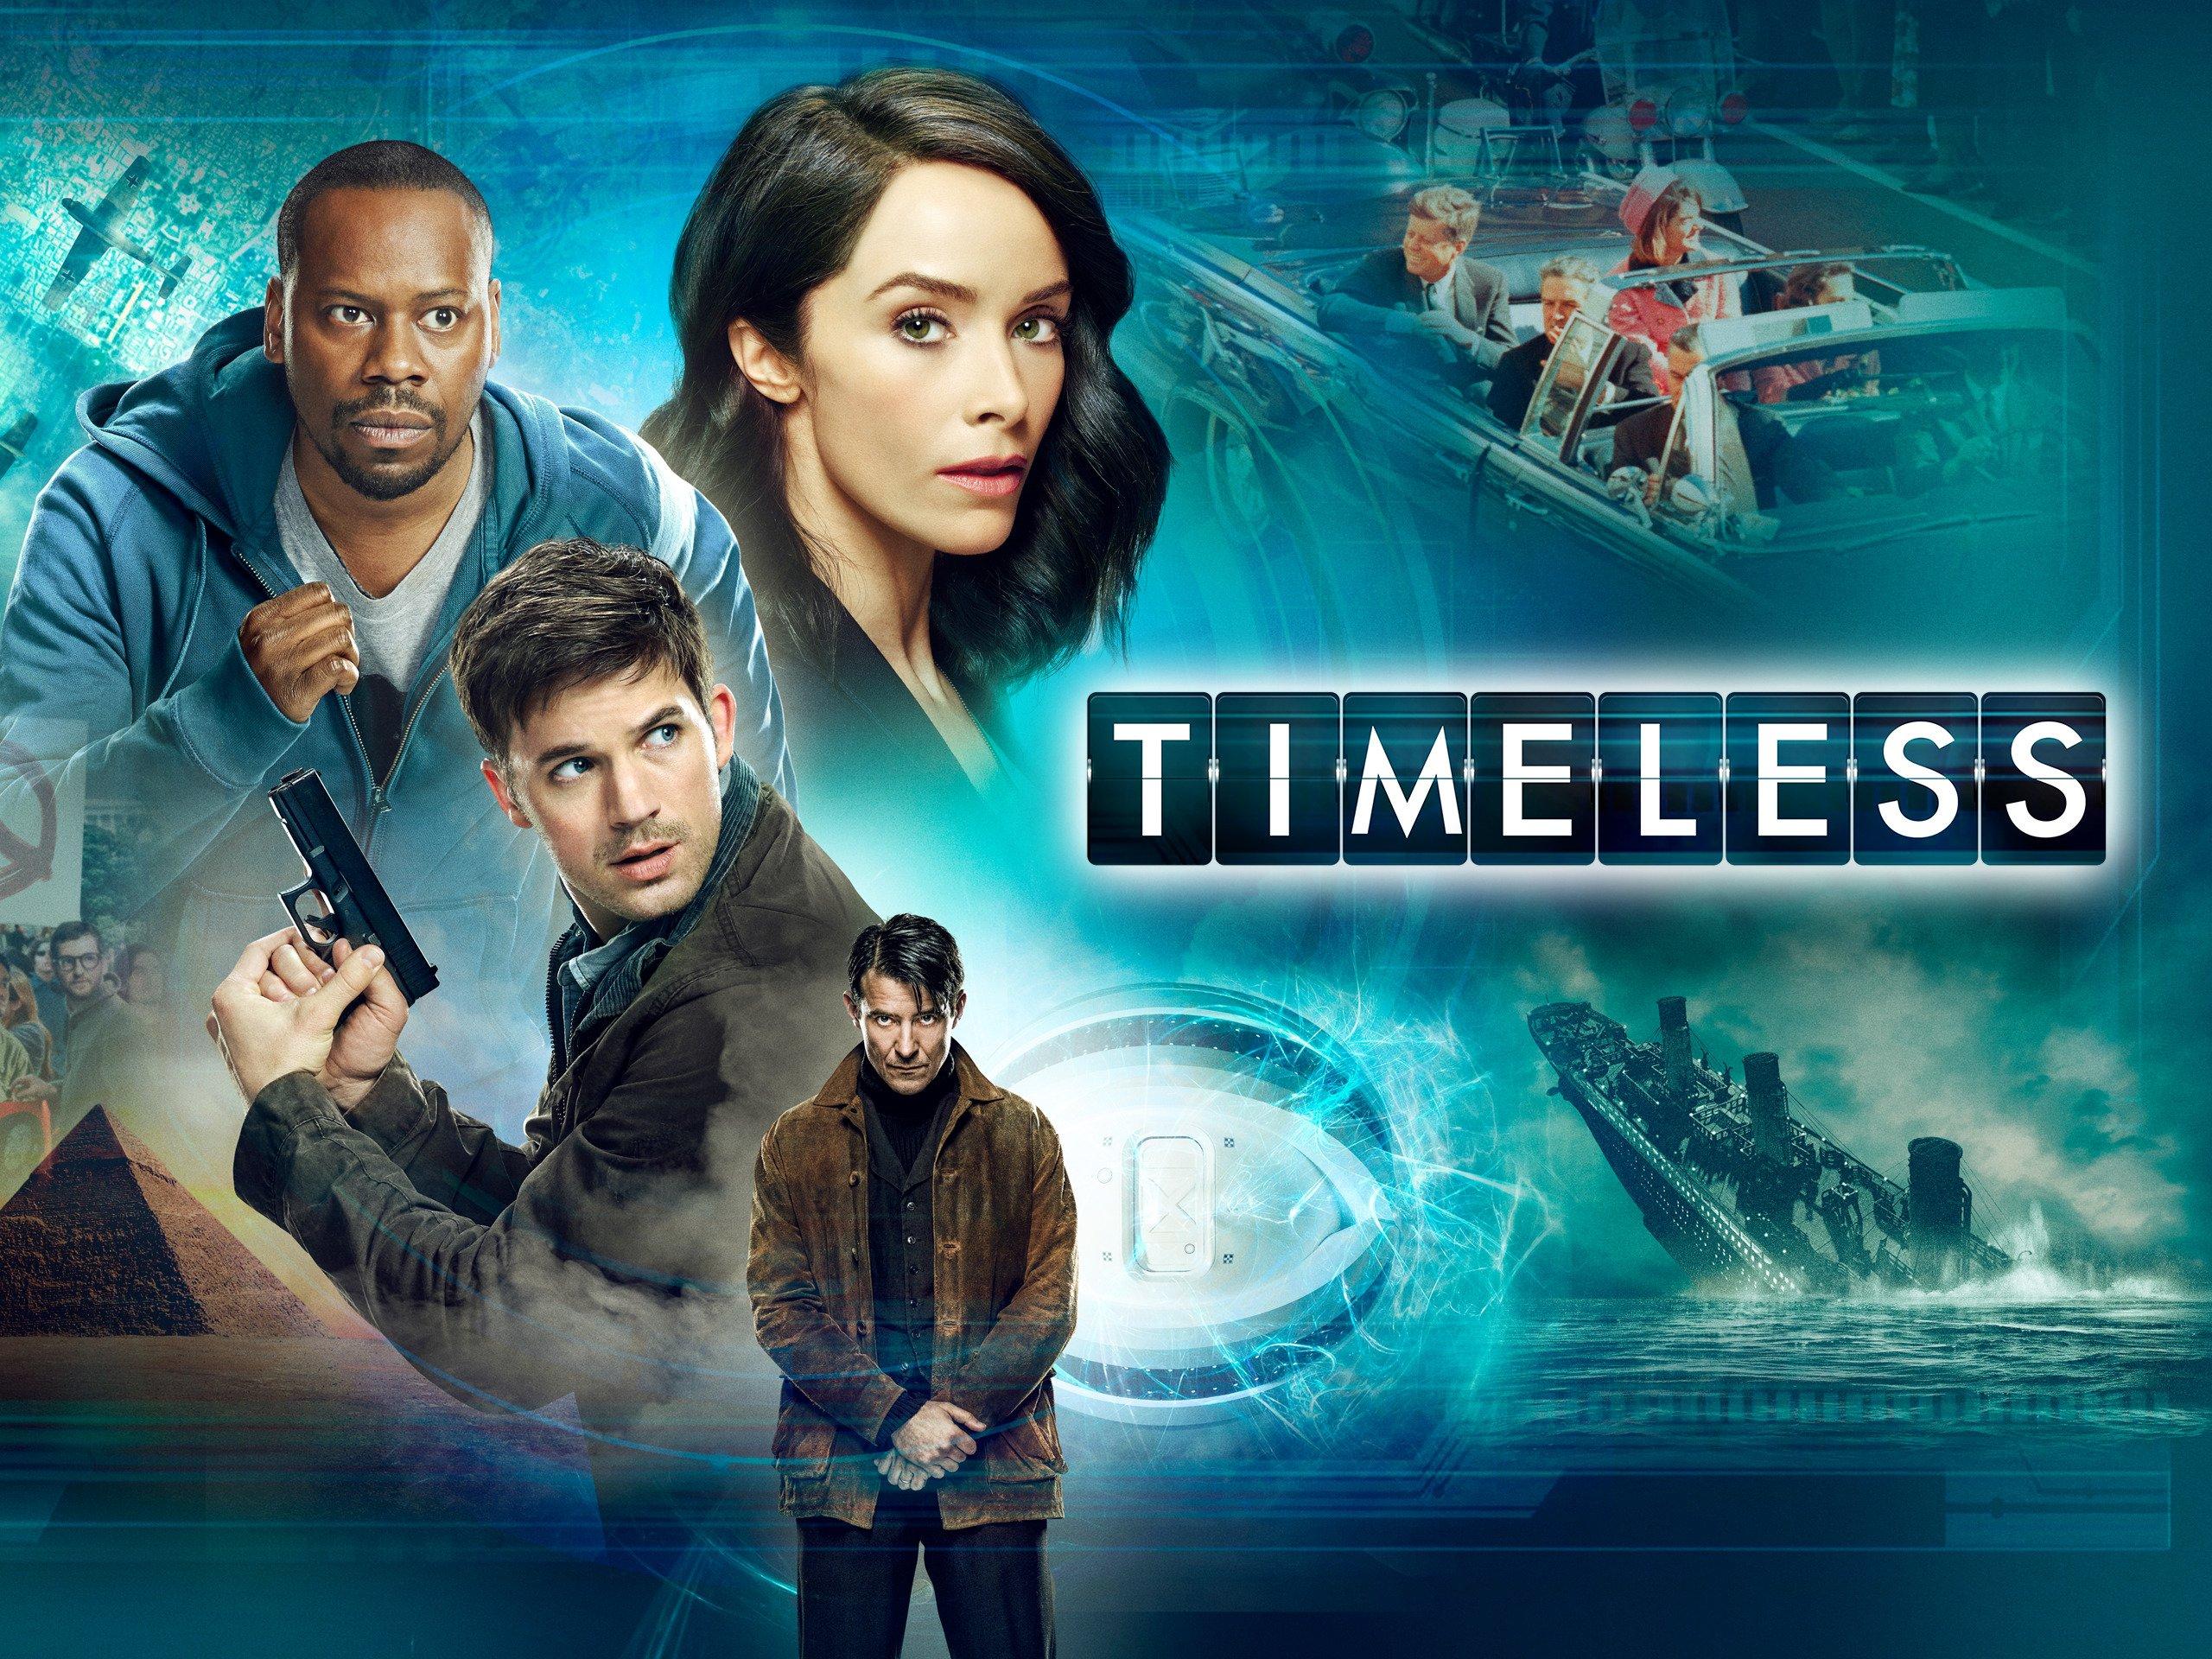 Amazon.com: Timeless - Season 1: Amazon Digital Services LLC